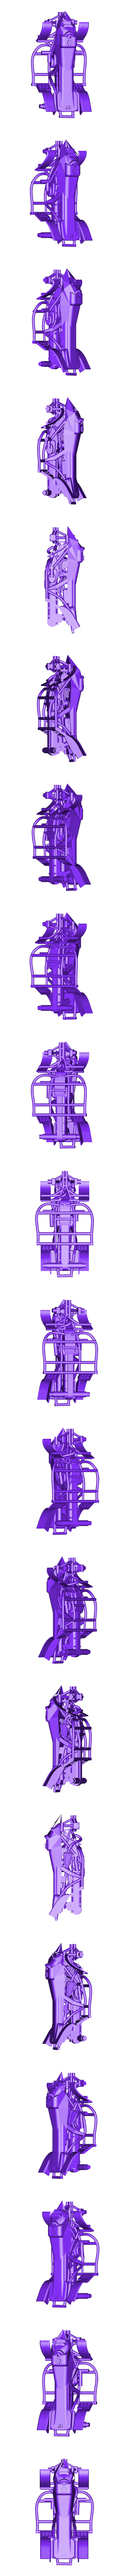 quad-body.stl Download free STL file quad bombardier DS 650 • 3D printer object, jasperbaudoin